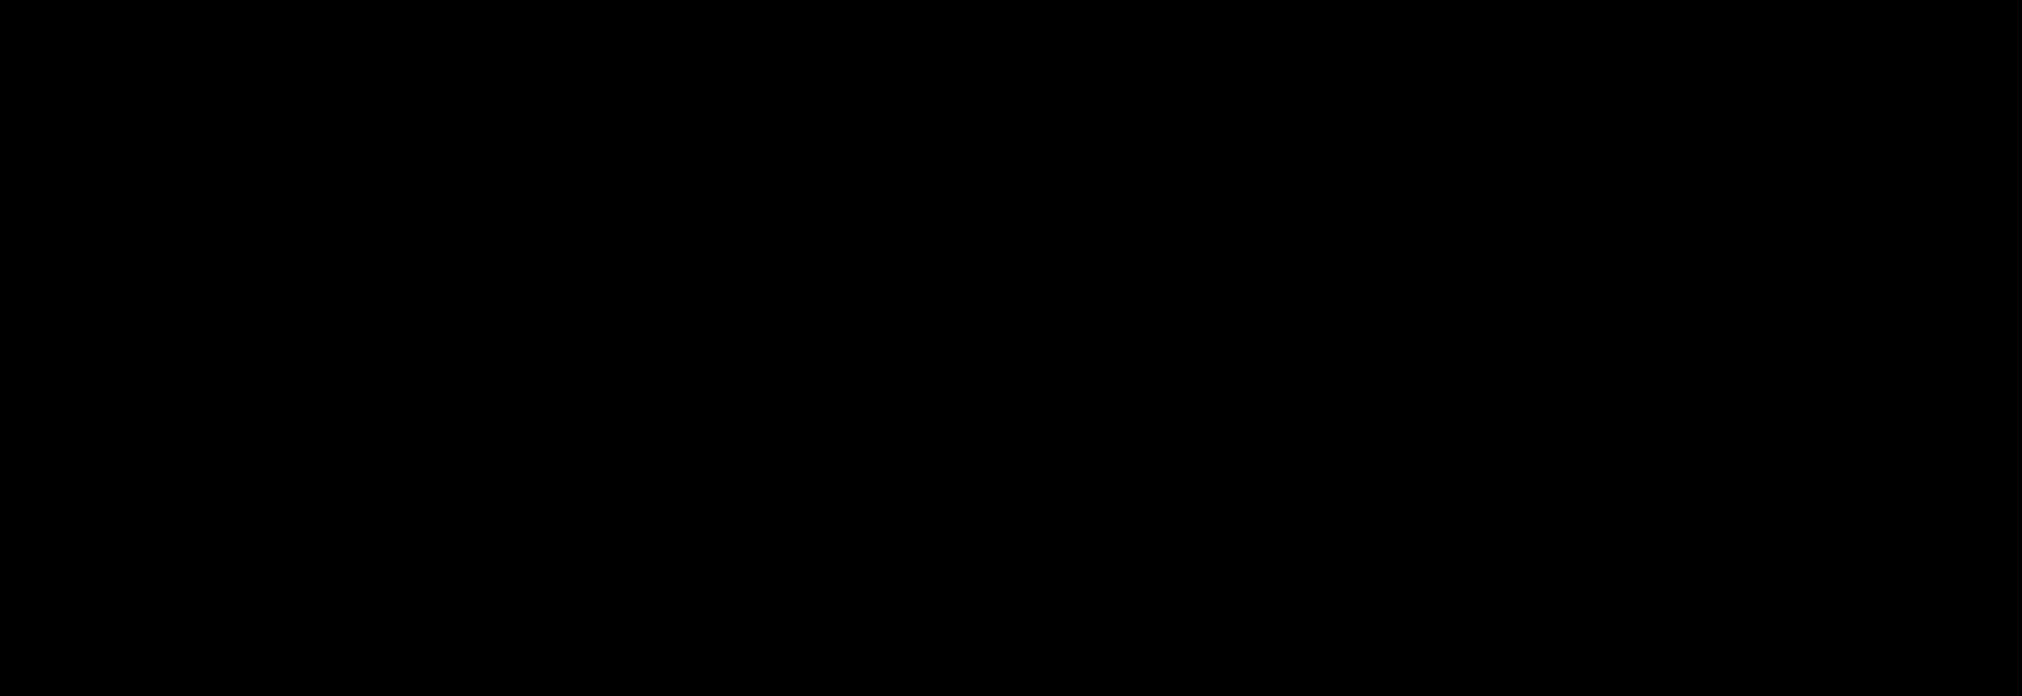 Curcumin pyrazole